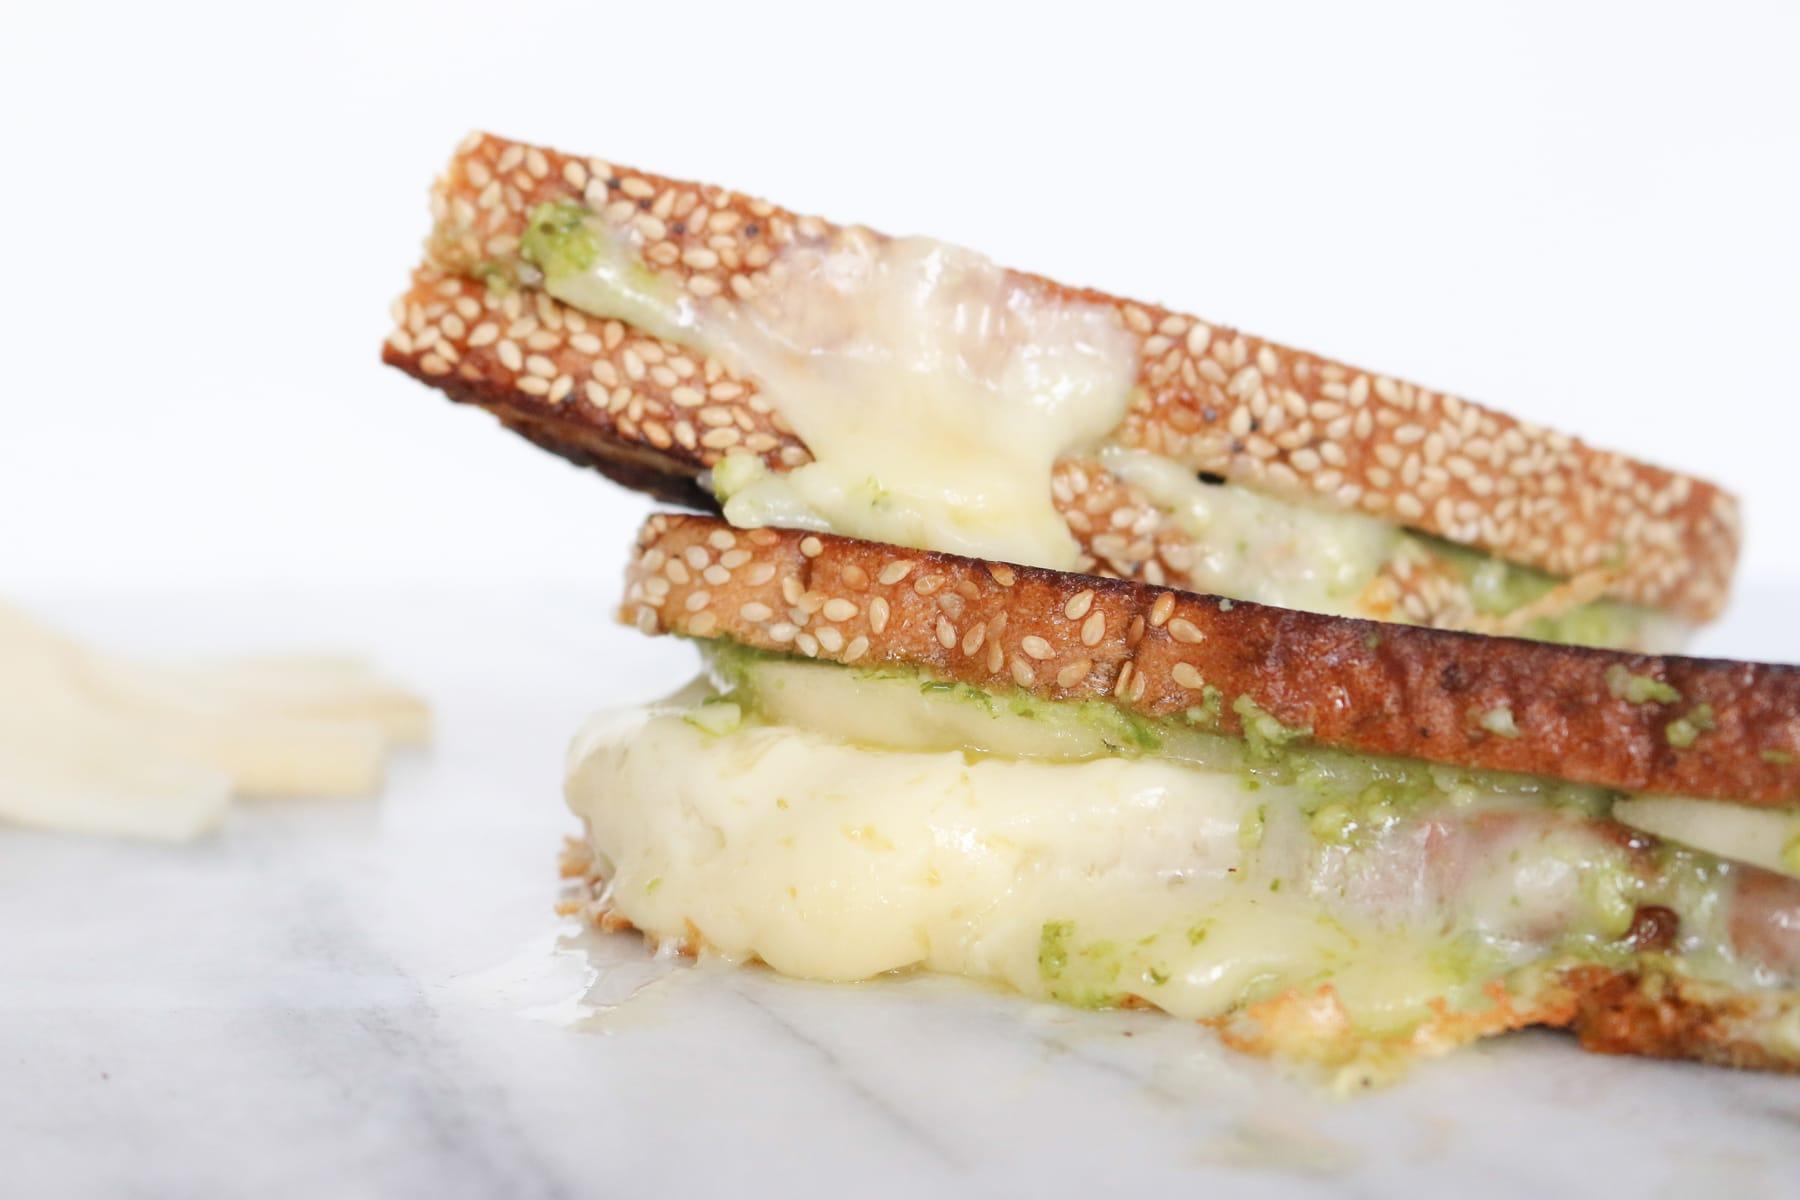 Havarti, Pesto & Pear Grilled Cheese Sandwich